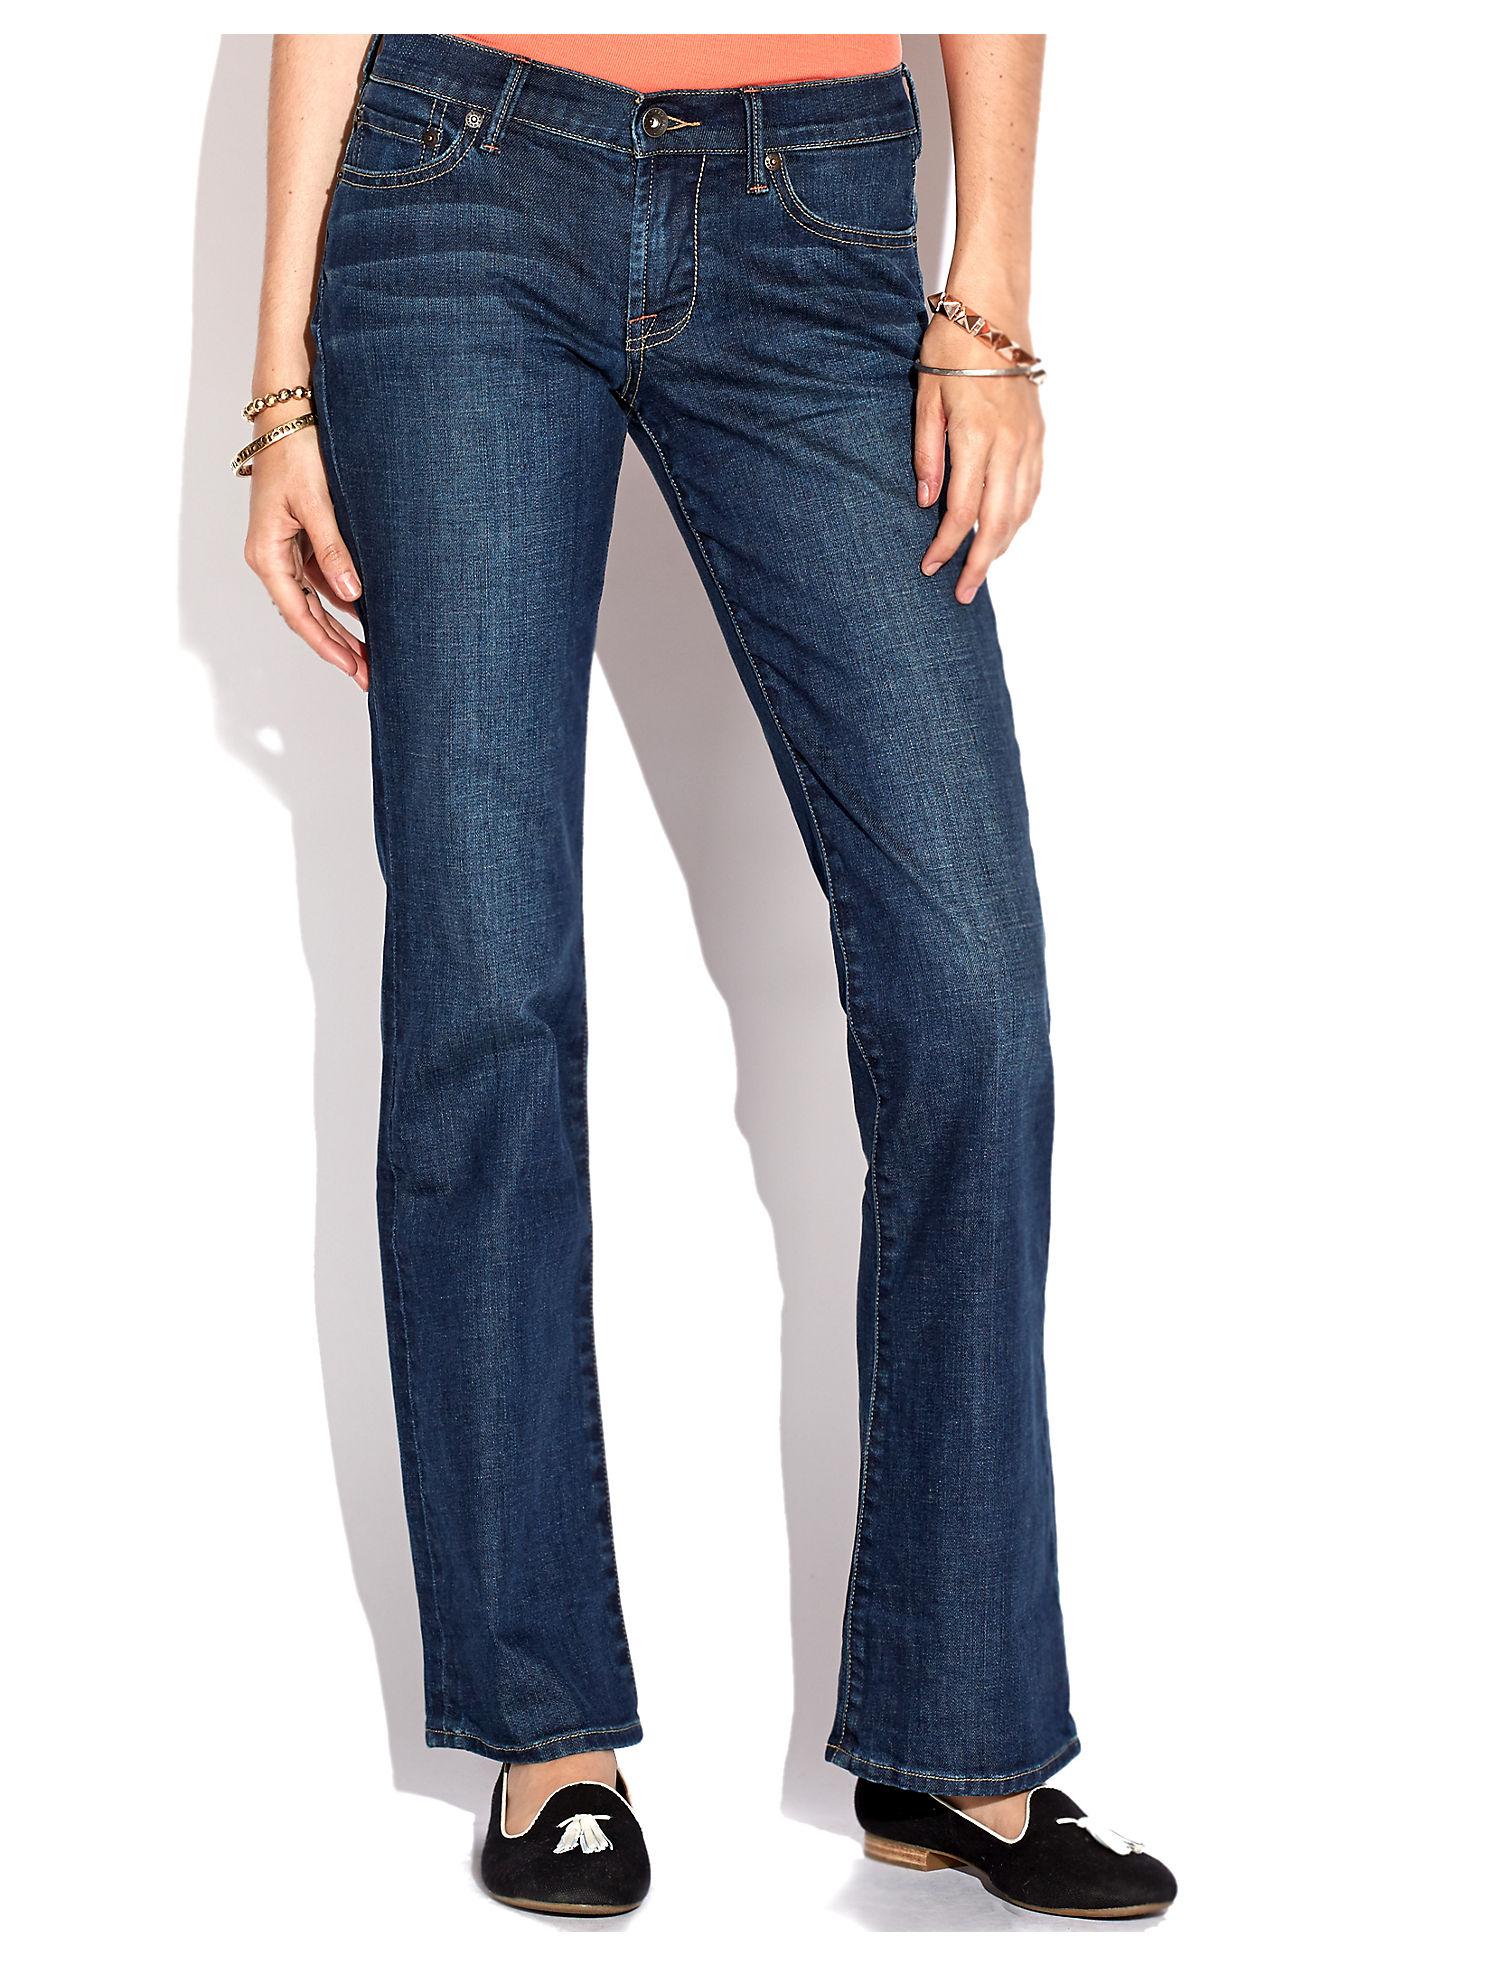 DENIM - Denim trousers low brand